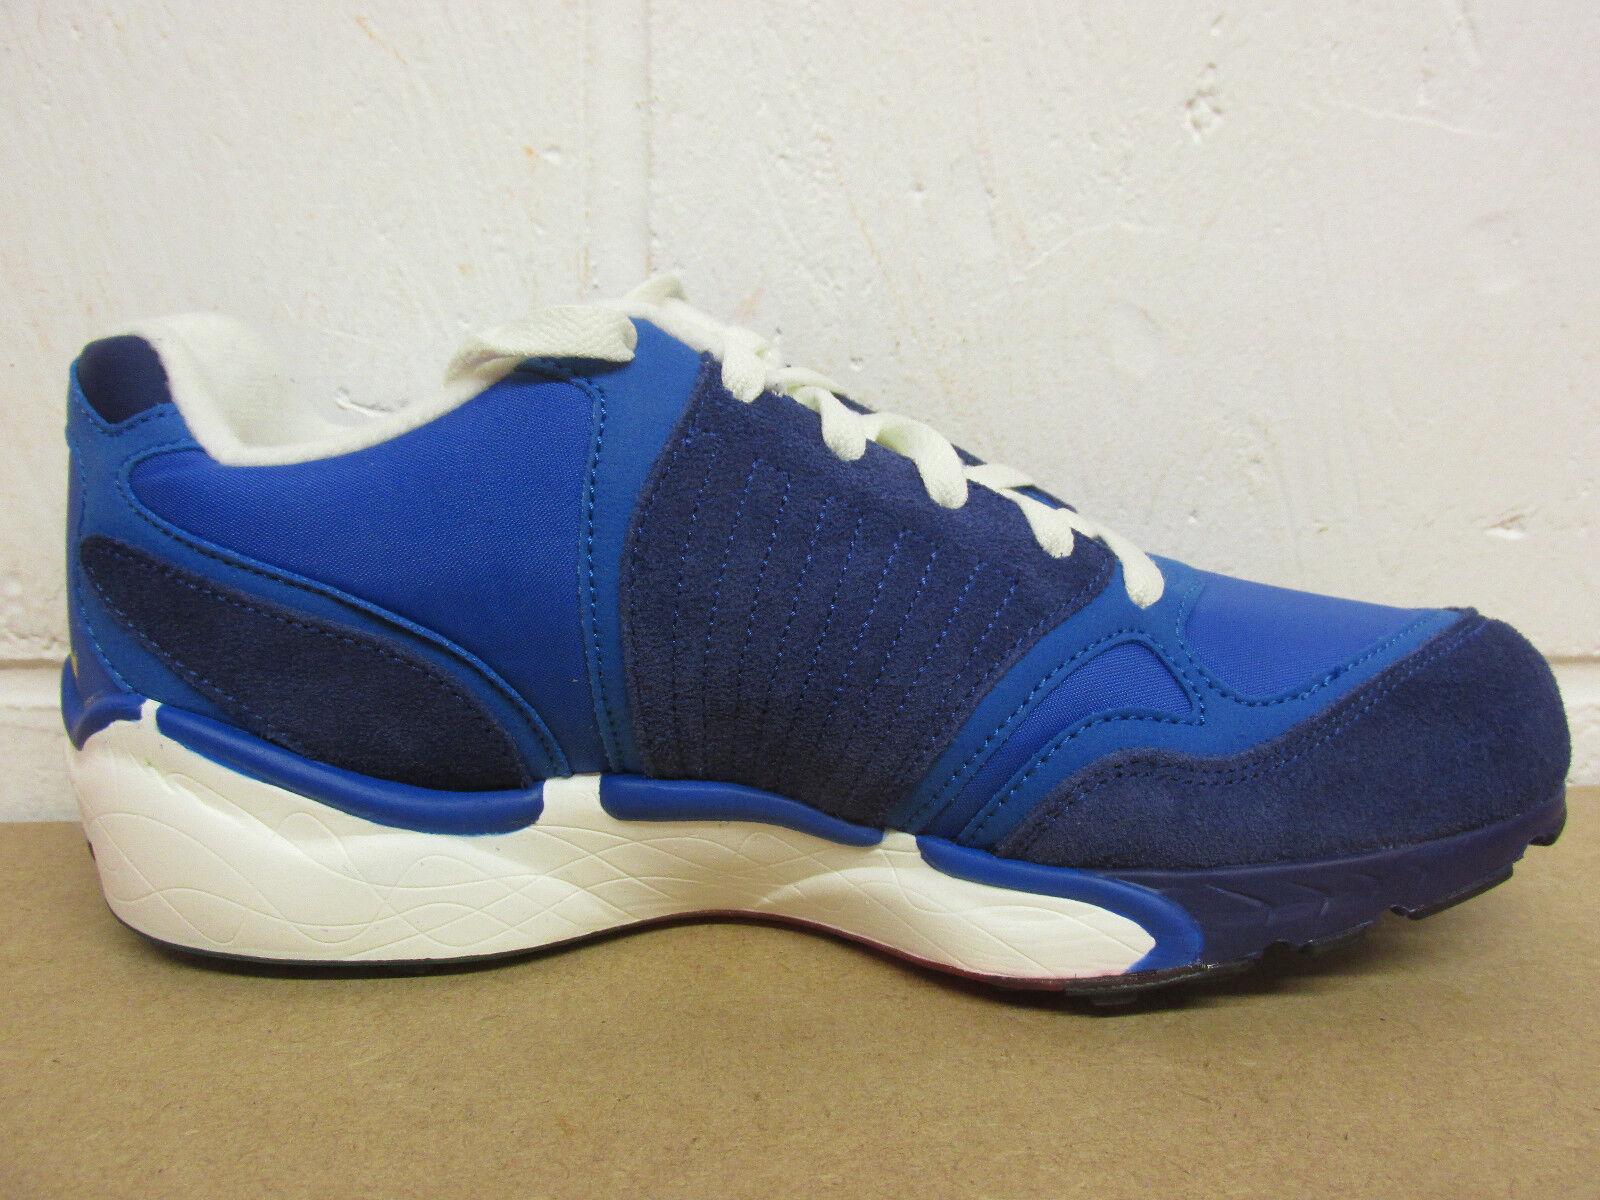 Nike Luft Zoom Talaria 16 Turnschuhe Herren Laufschuhe 844695 401 Turnschuhe 16 b46fe8